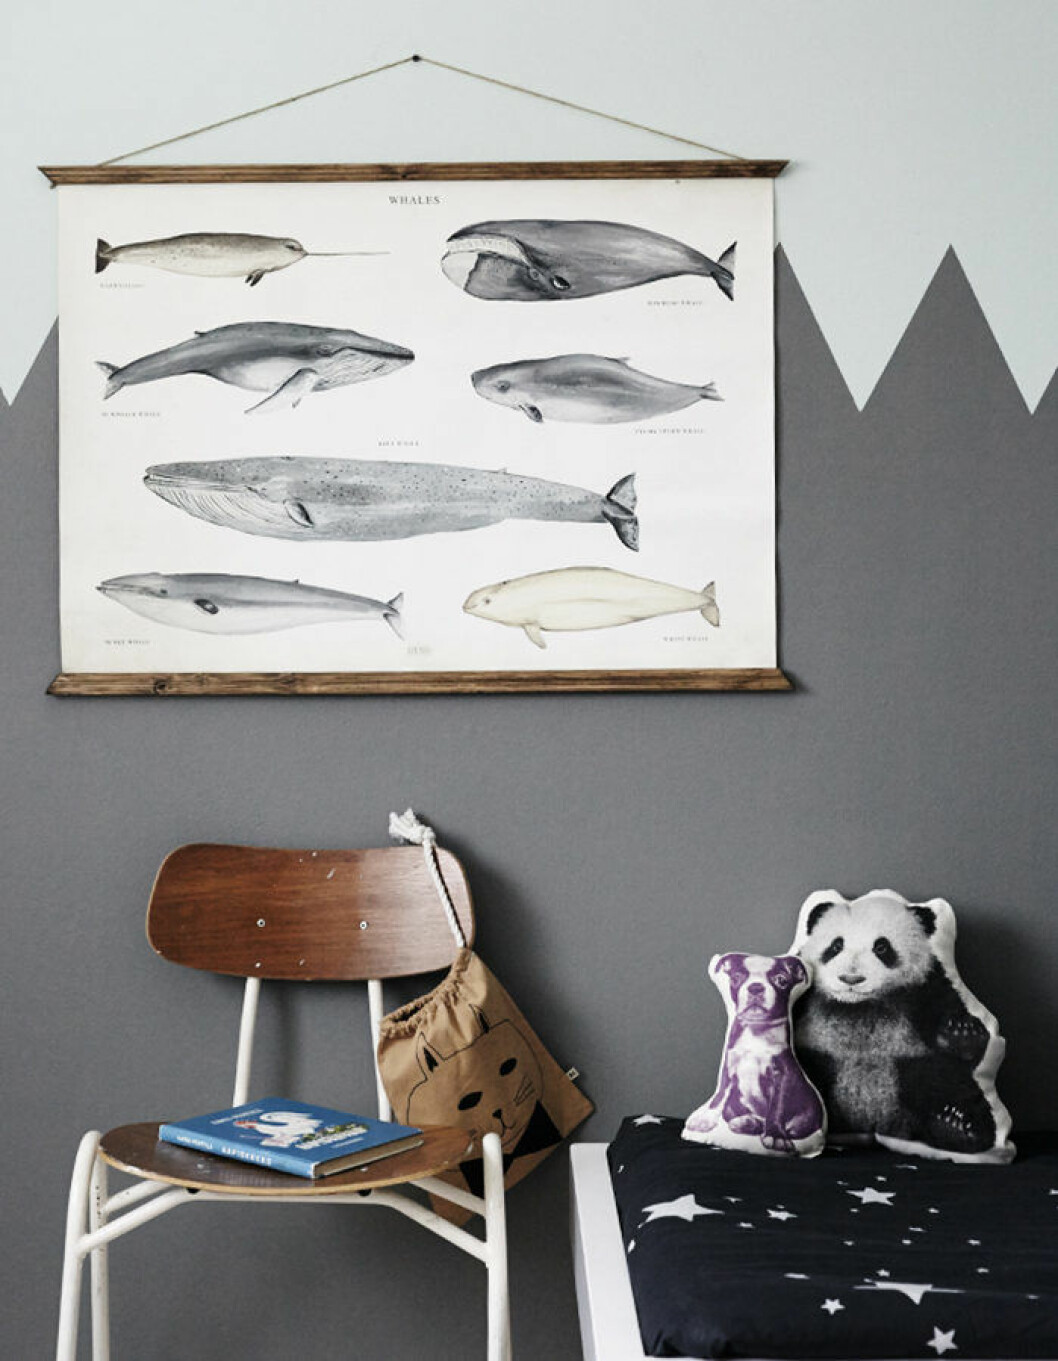 Whales tavla